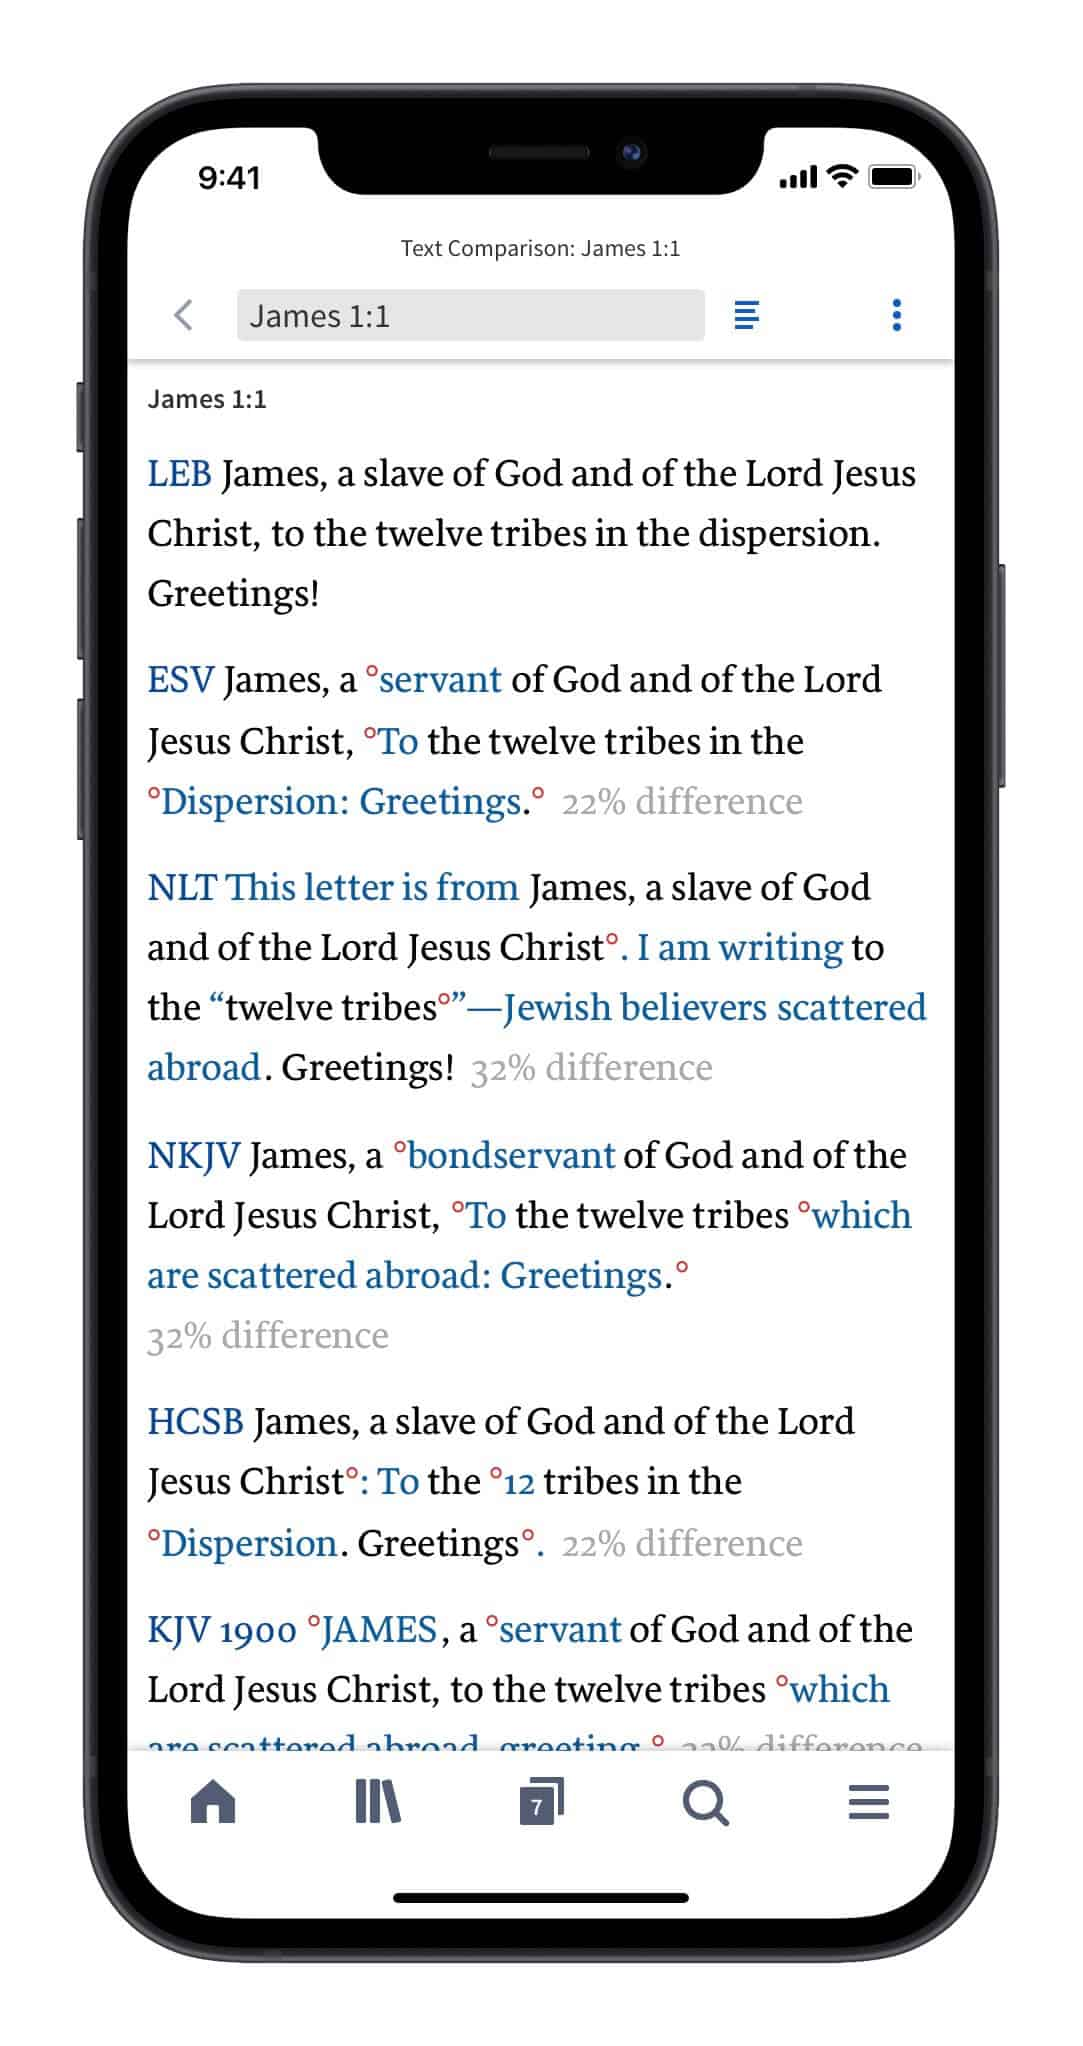 Comparison of Bible translations for James 1:1